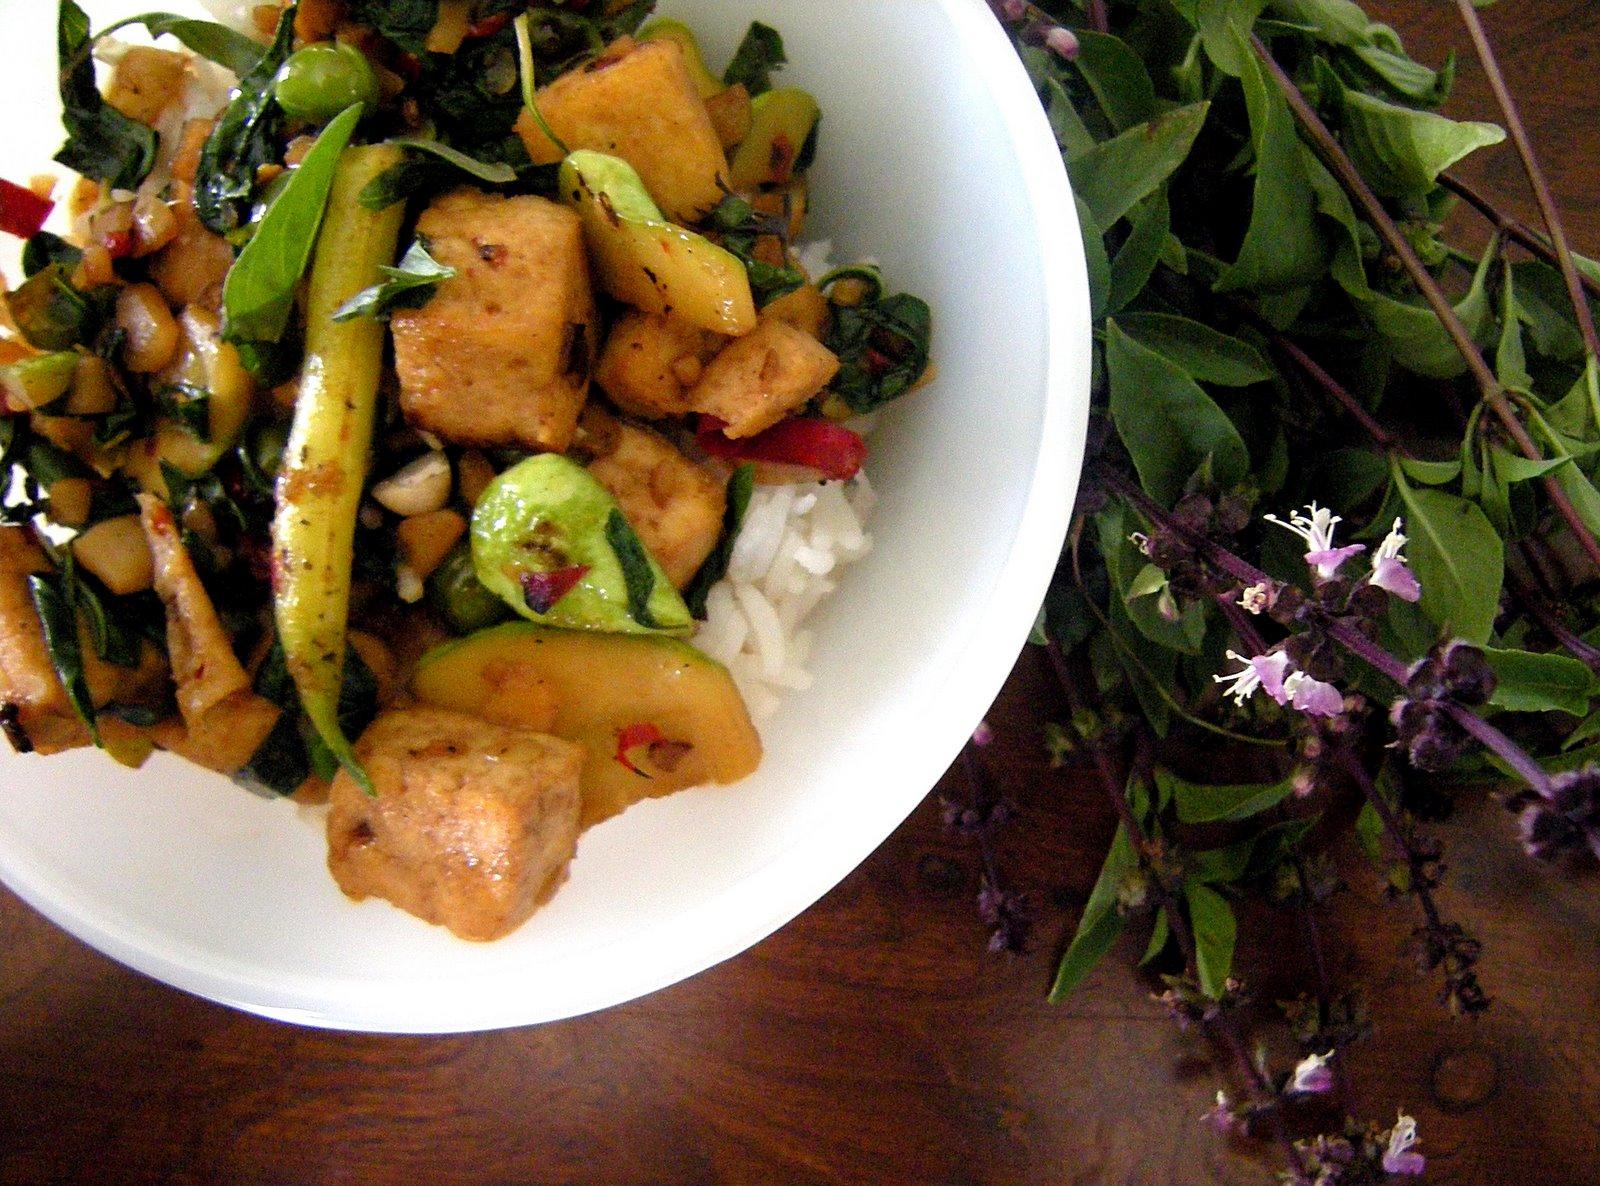 basil stir fry put n 37 izak sweet chiles thai thai basil stir fry ...